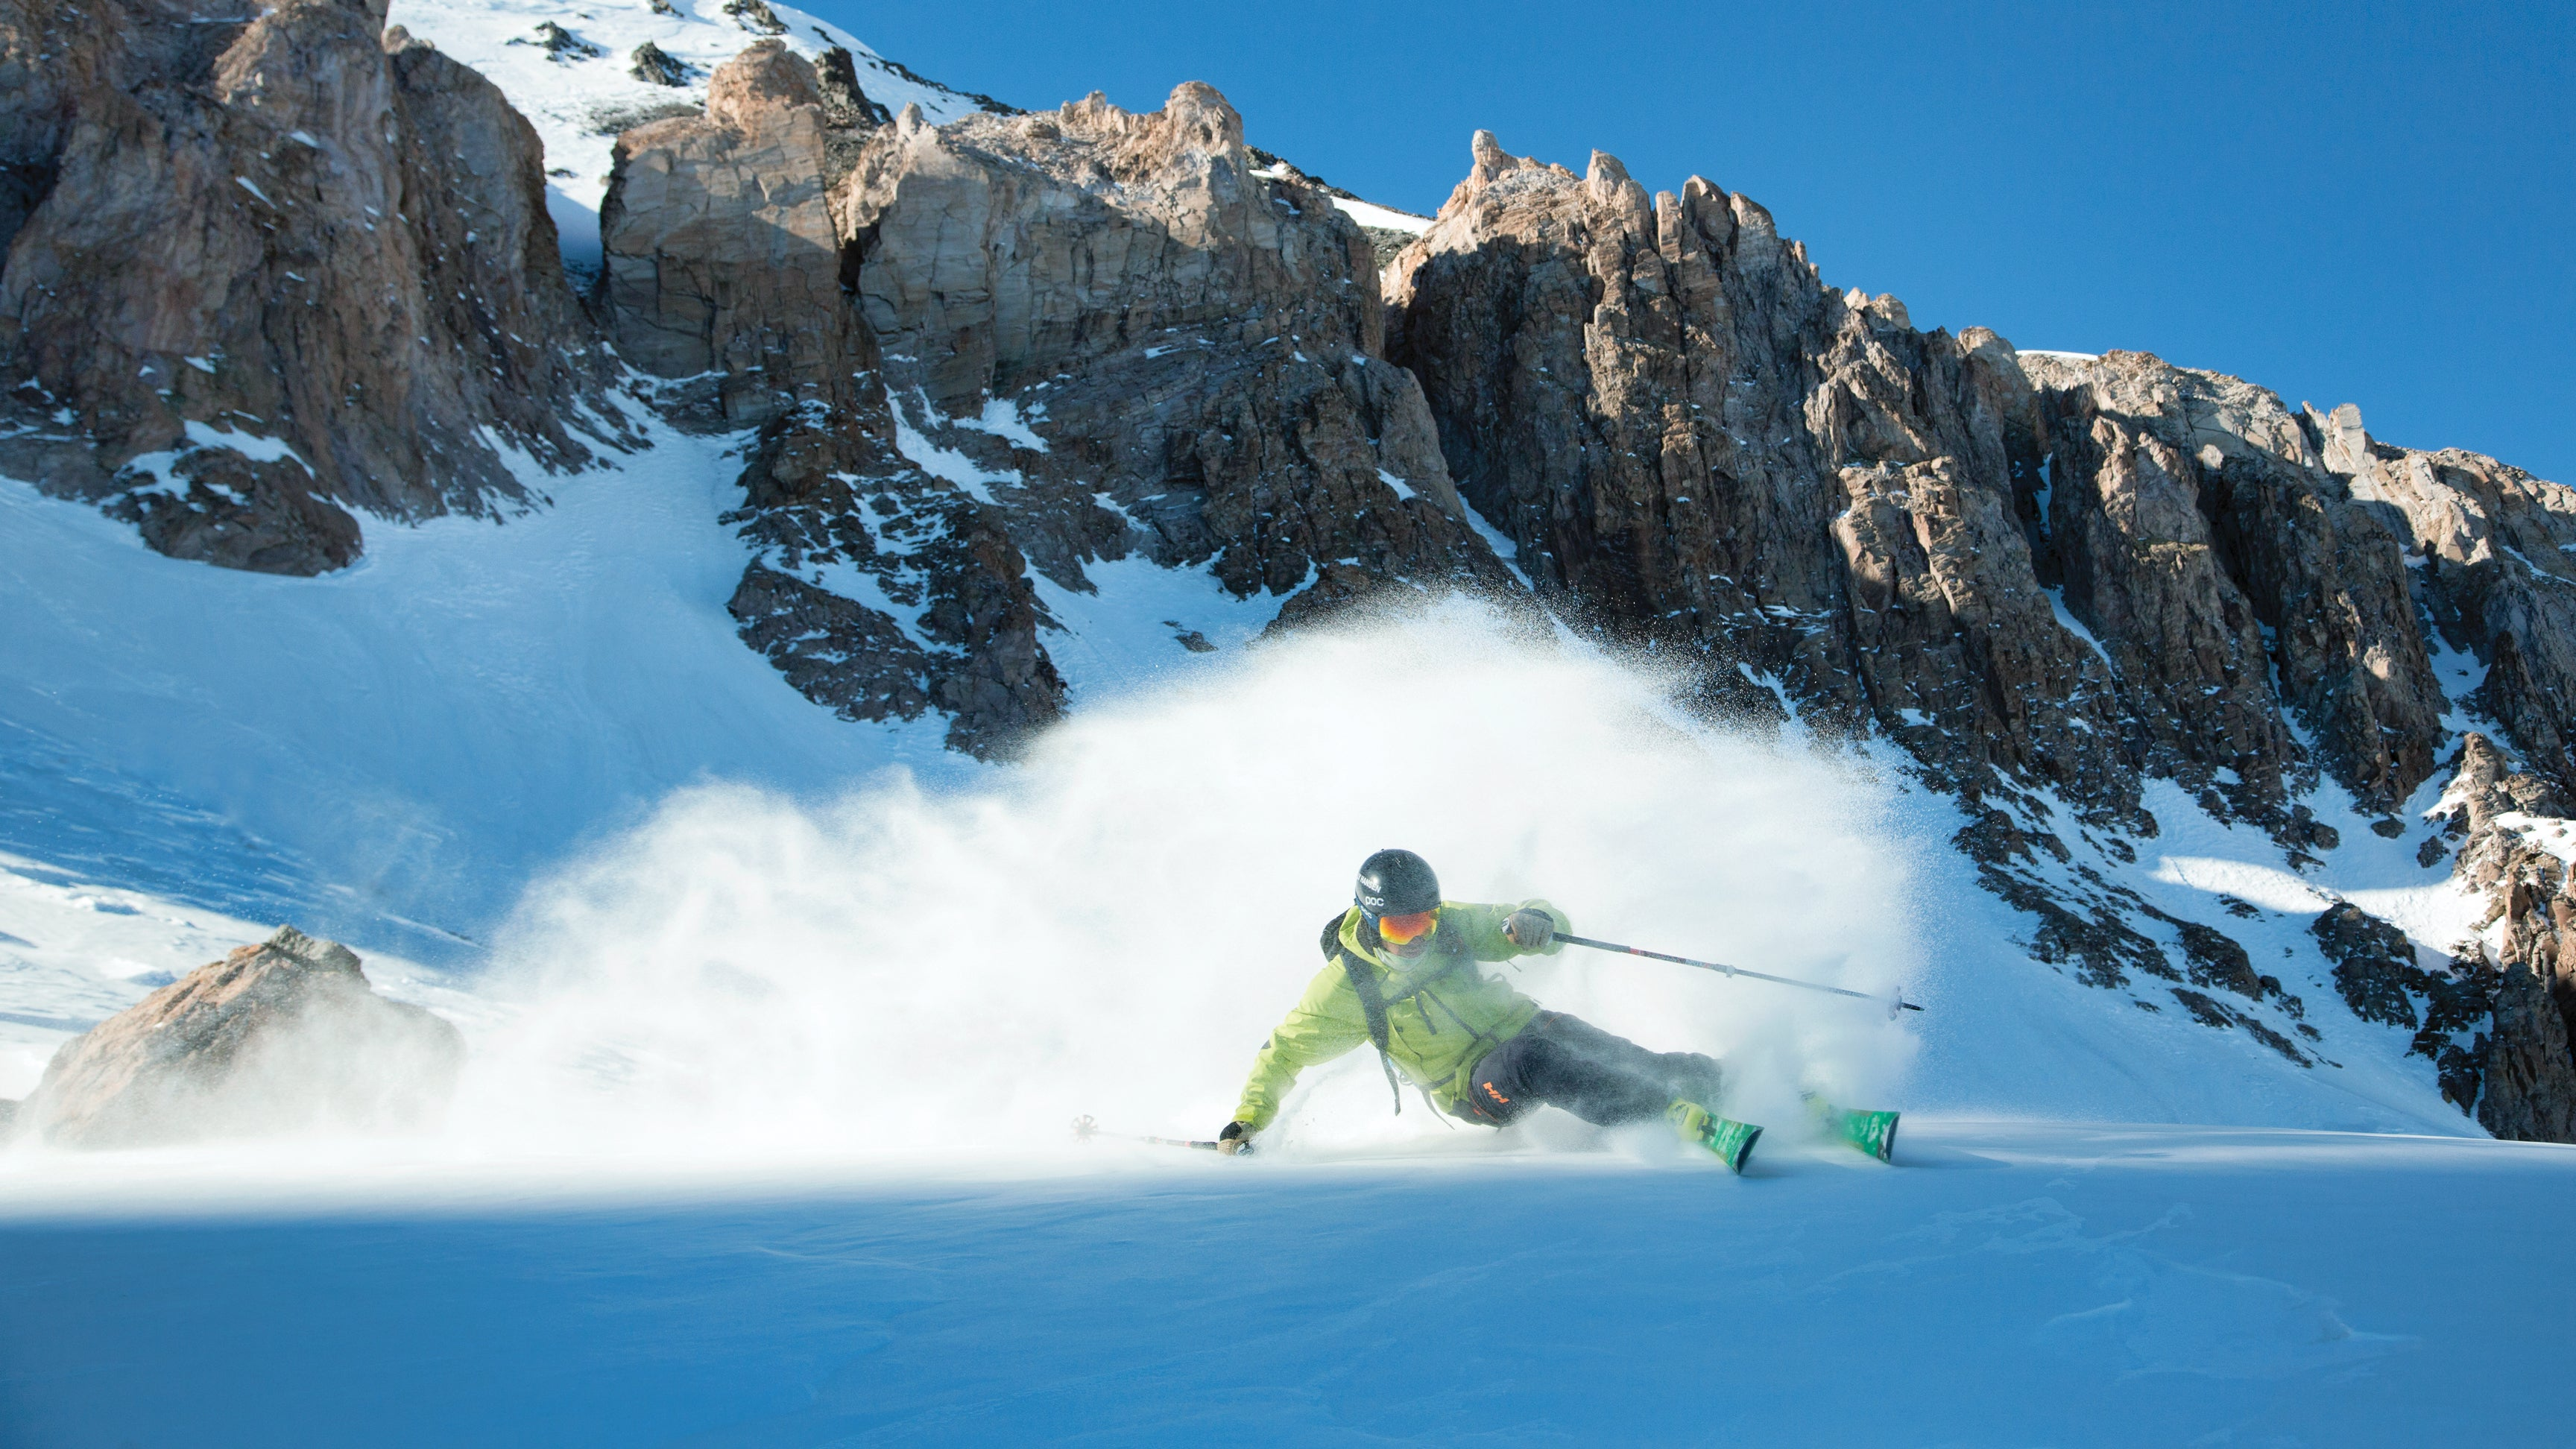 Marcus Caston Carve Valle Nevado